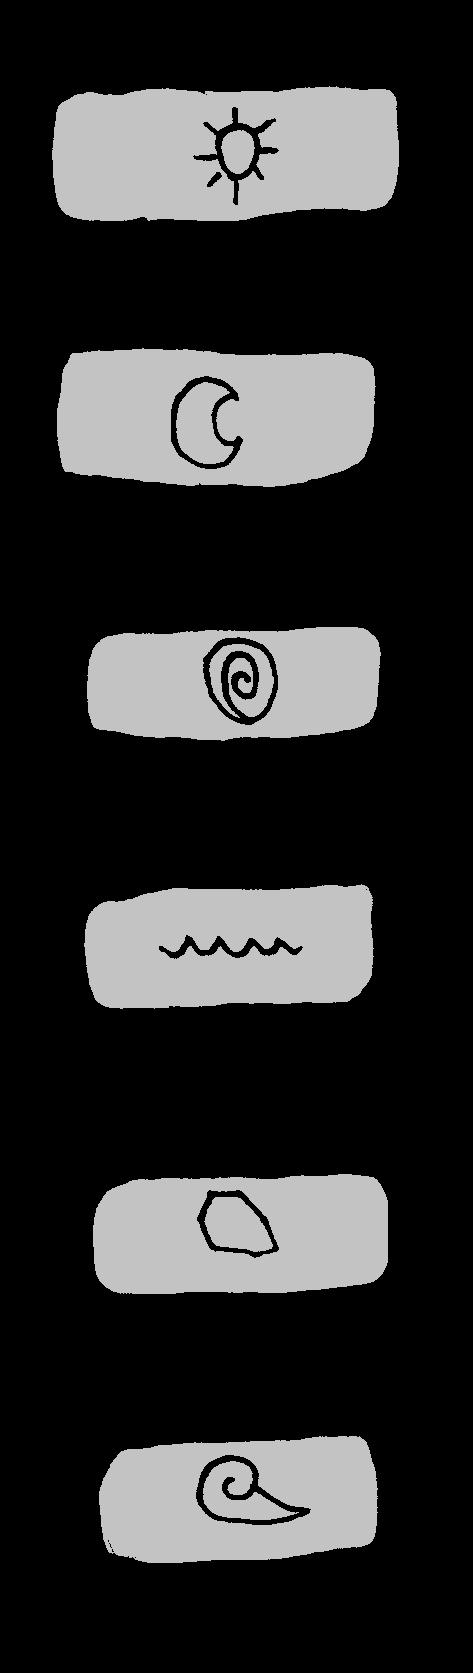 Naruto headband symbol choice image symbol and sign ideas mlpfim naruto mlp headband symbols by sigmatheartist on deviantart mlpfim naruto mlp headband symbols by sigmatheartist buycottarizona